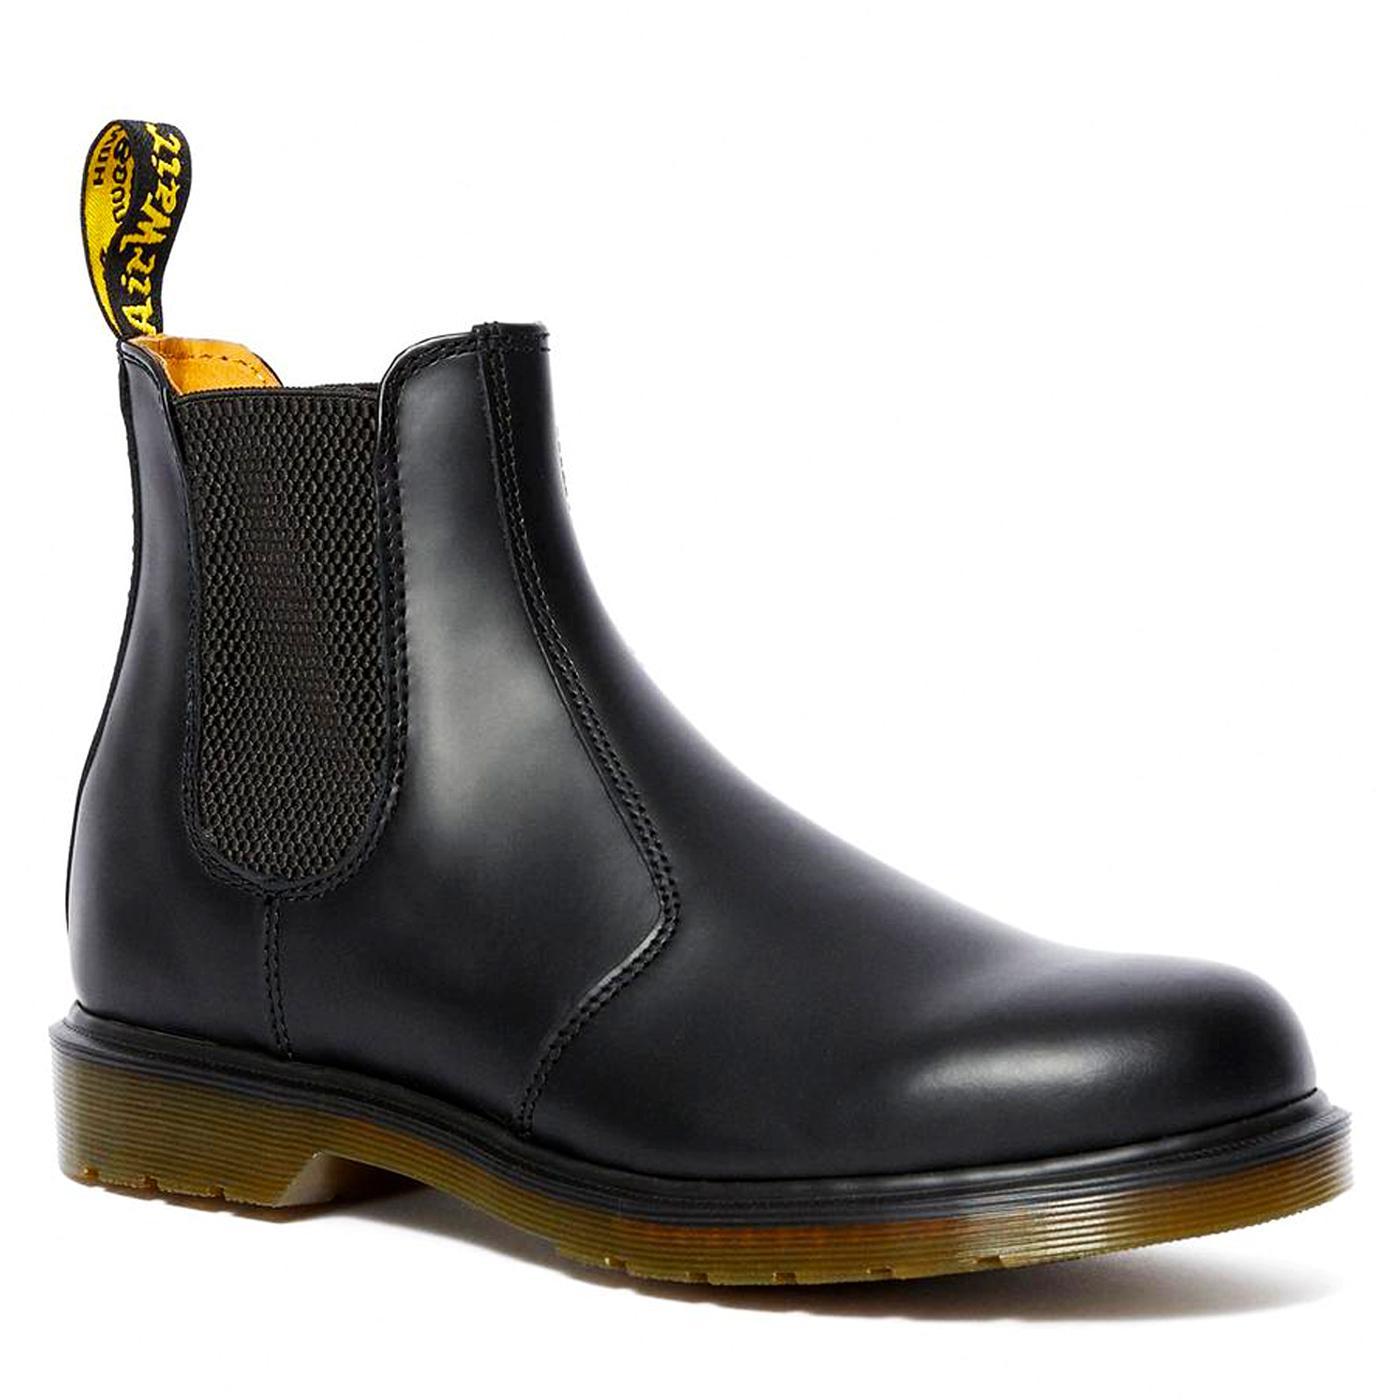 DR MARTENS 2976 Smooth Mod Chelsea Boots (Black)